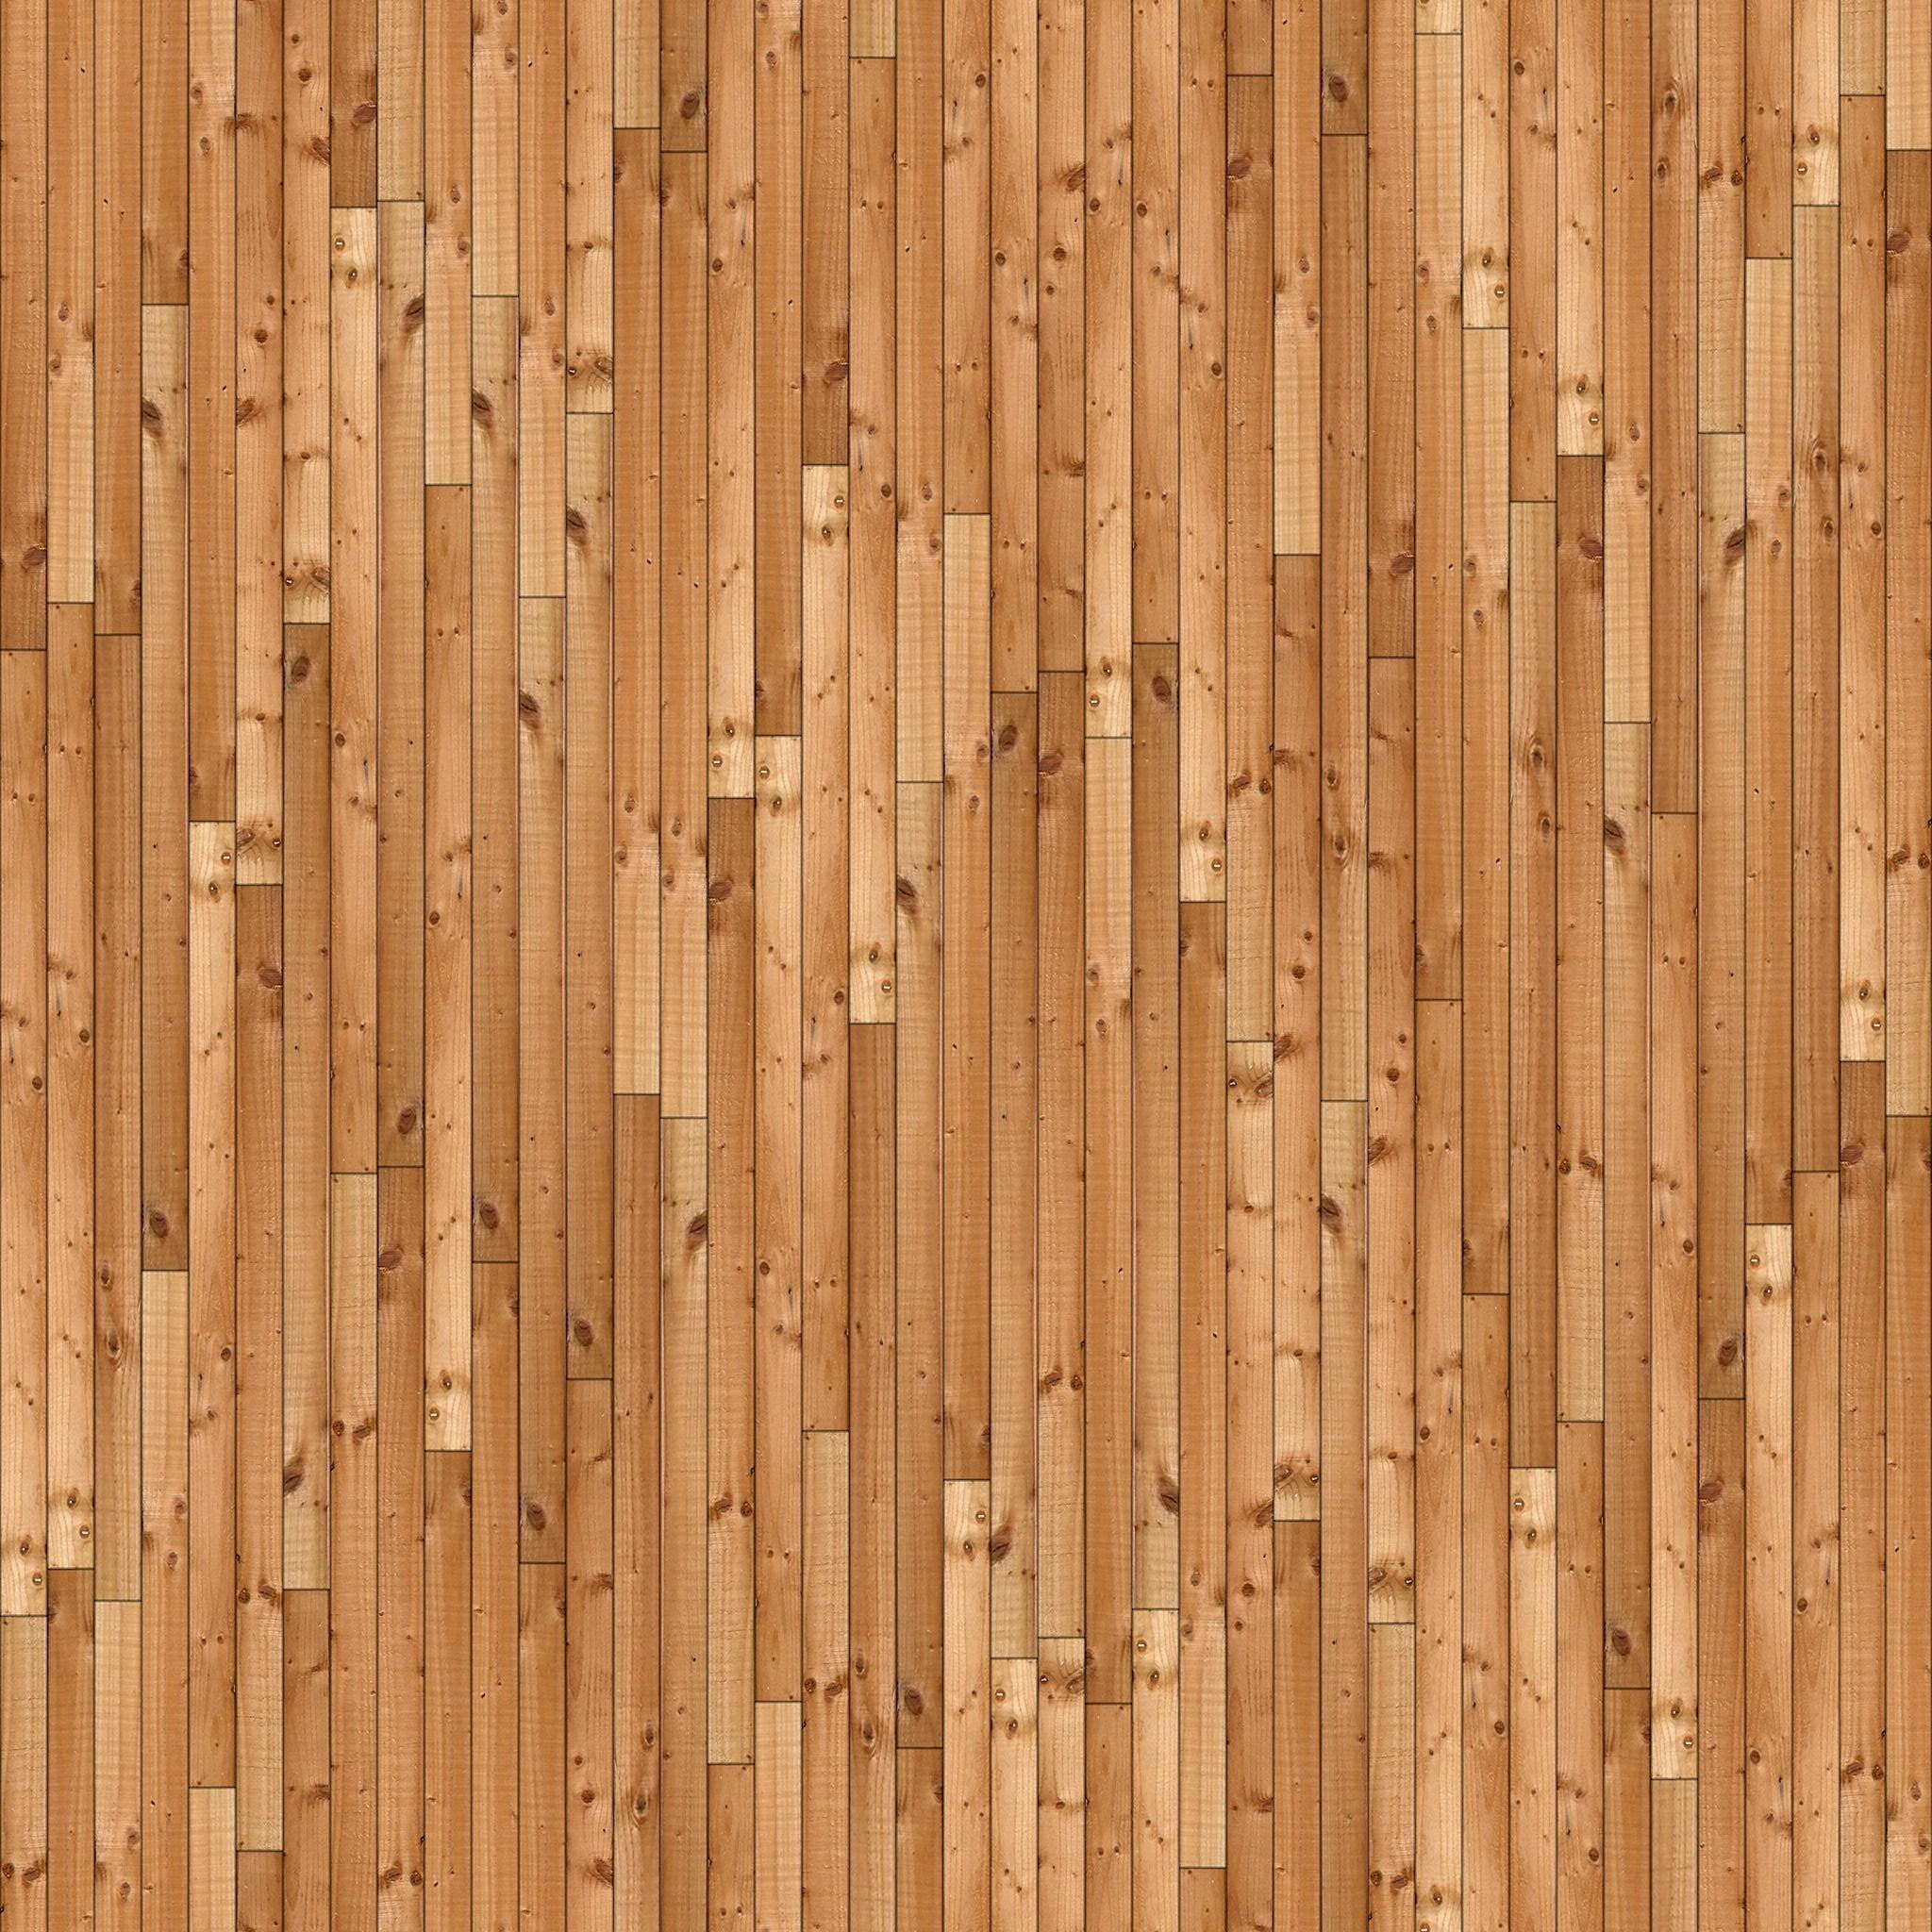 hardwood floors background. Inspiring Ideas Wood Floors Background 10 Floor Wallpaper 2048x2048 Textures Backgrounds Hardwood